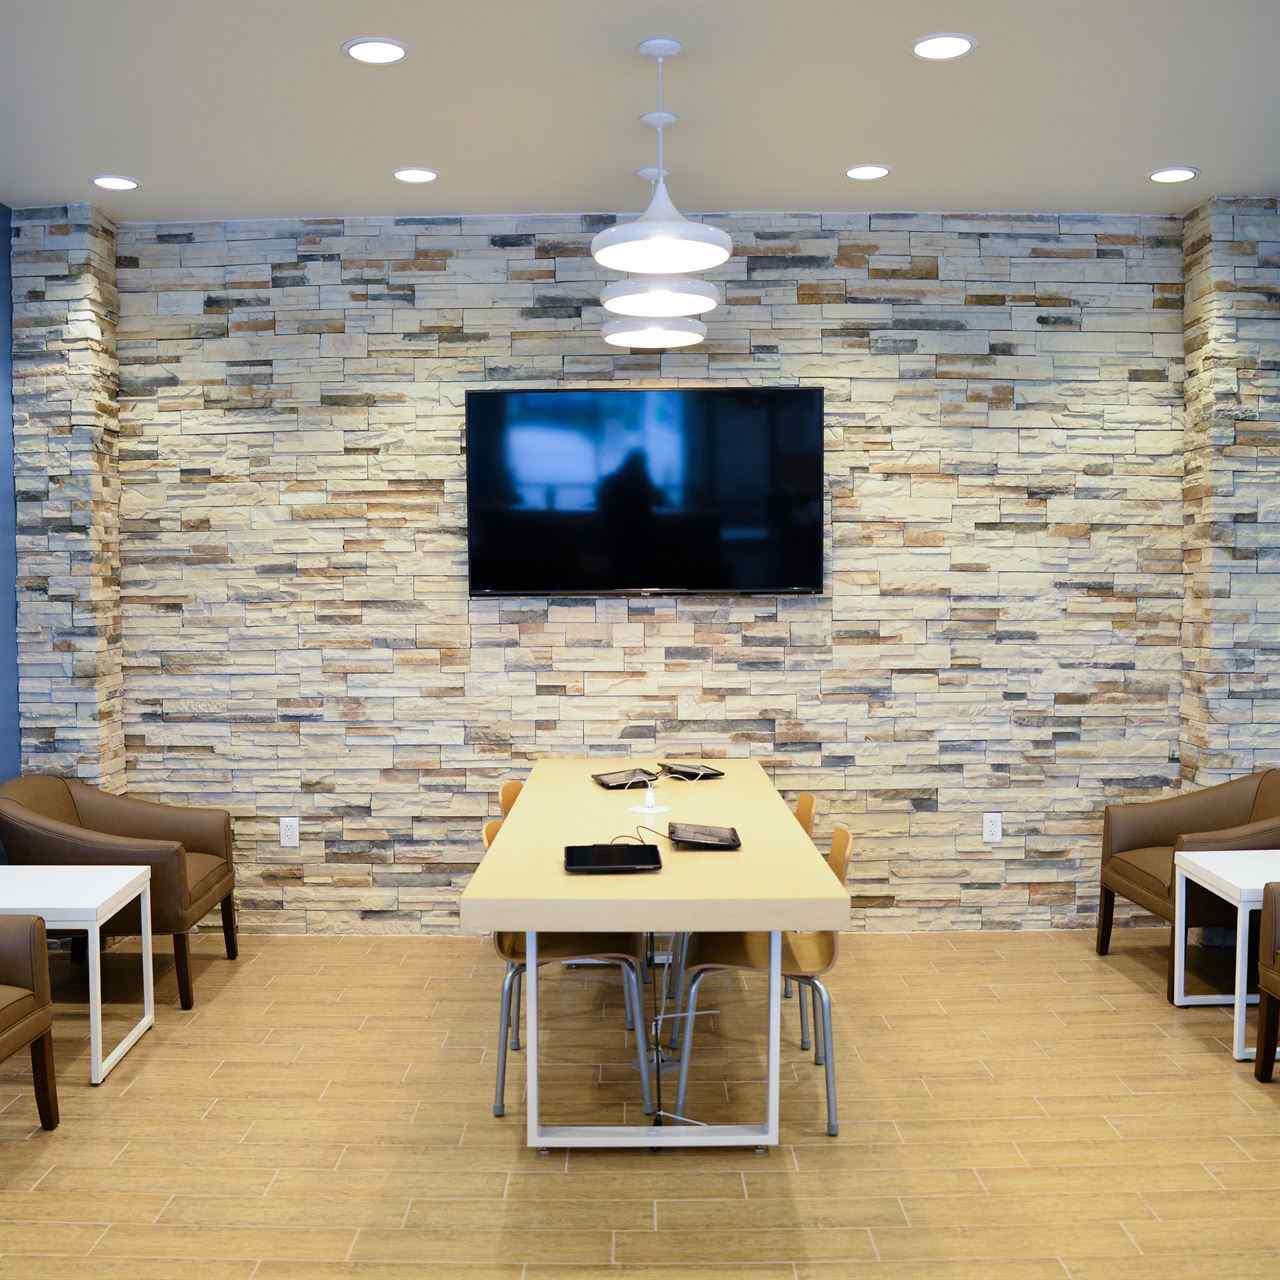 Wood Tile Flooring Store in Houston, TX